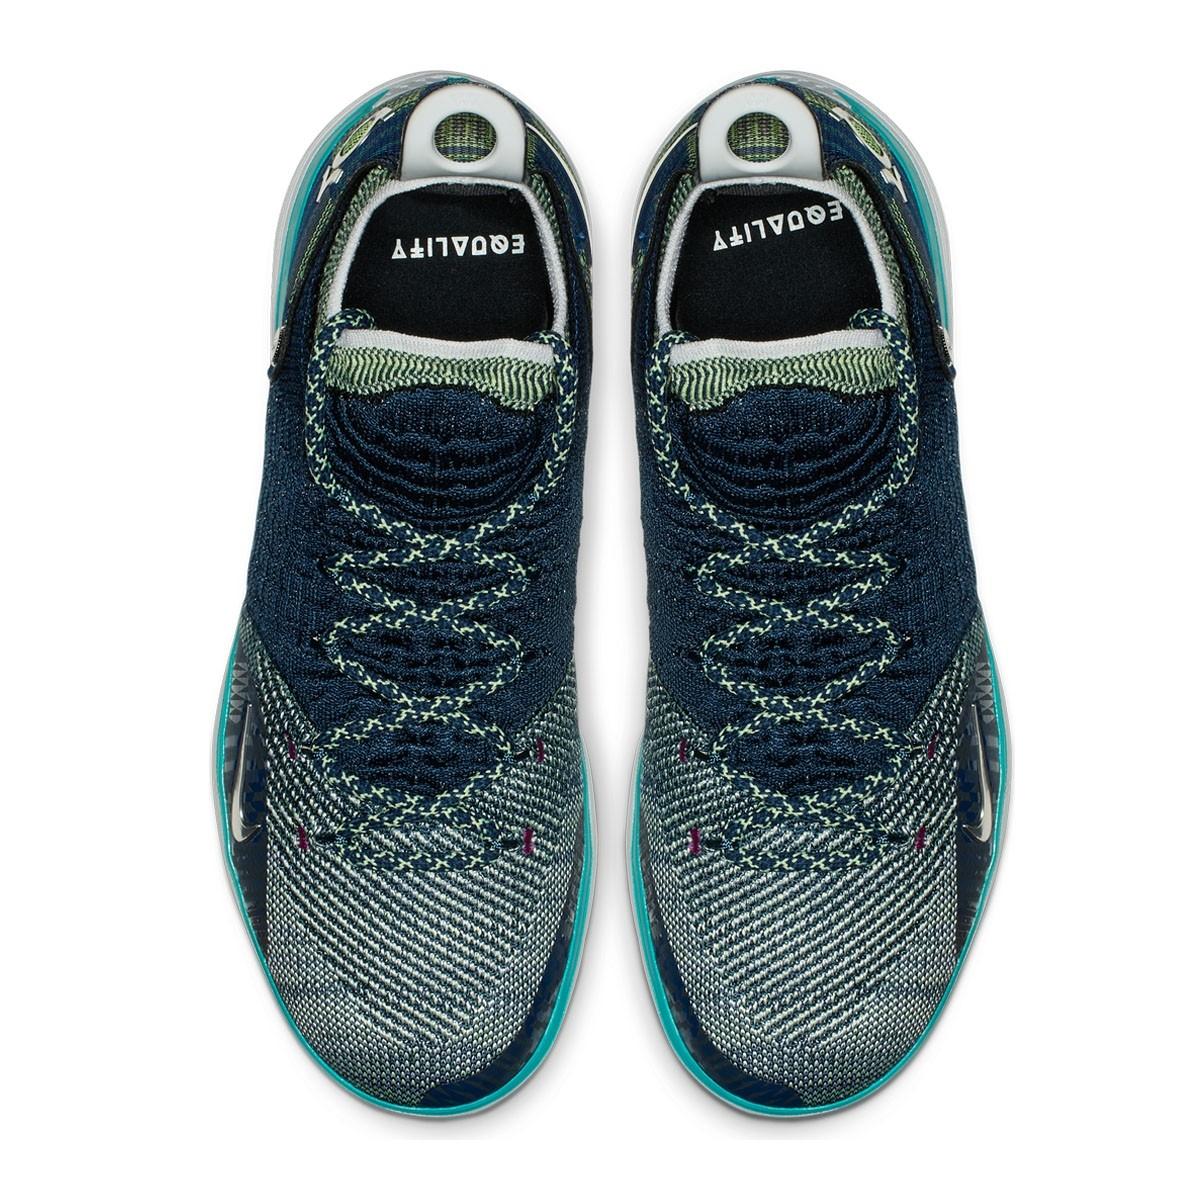 081aba2ac75 Buy Nike KD 11  BHM  Basketball shoes   sneakers